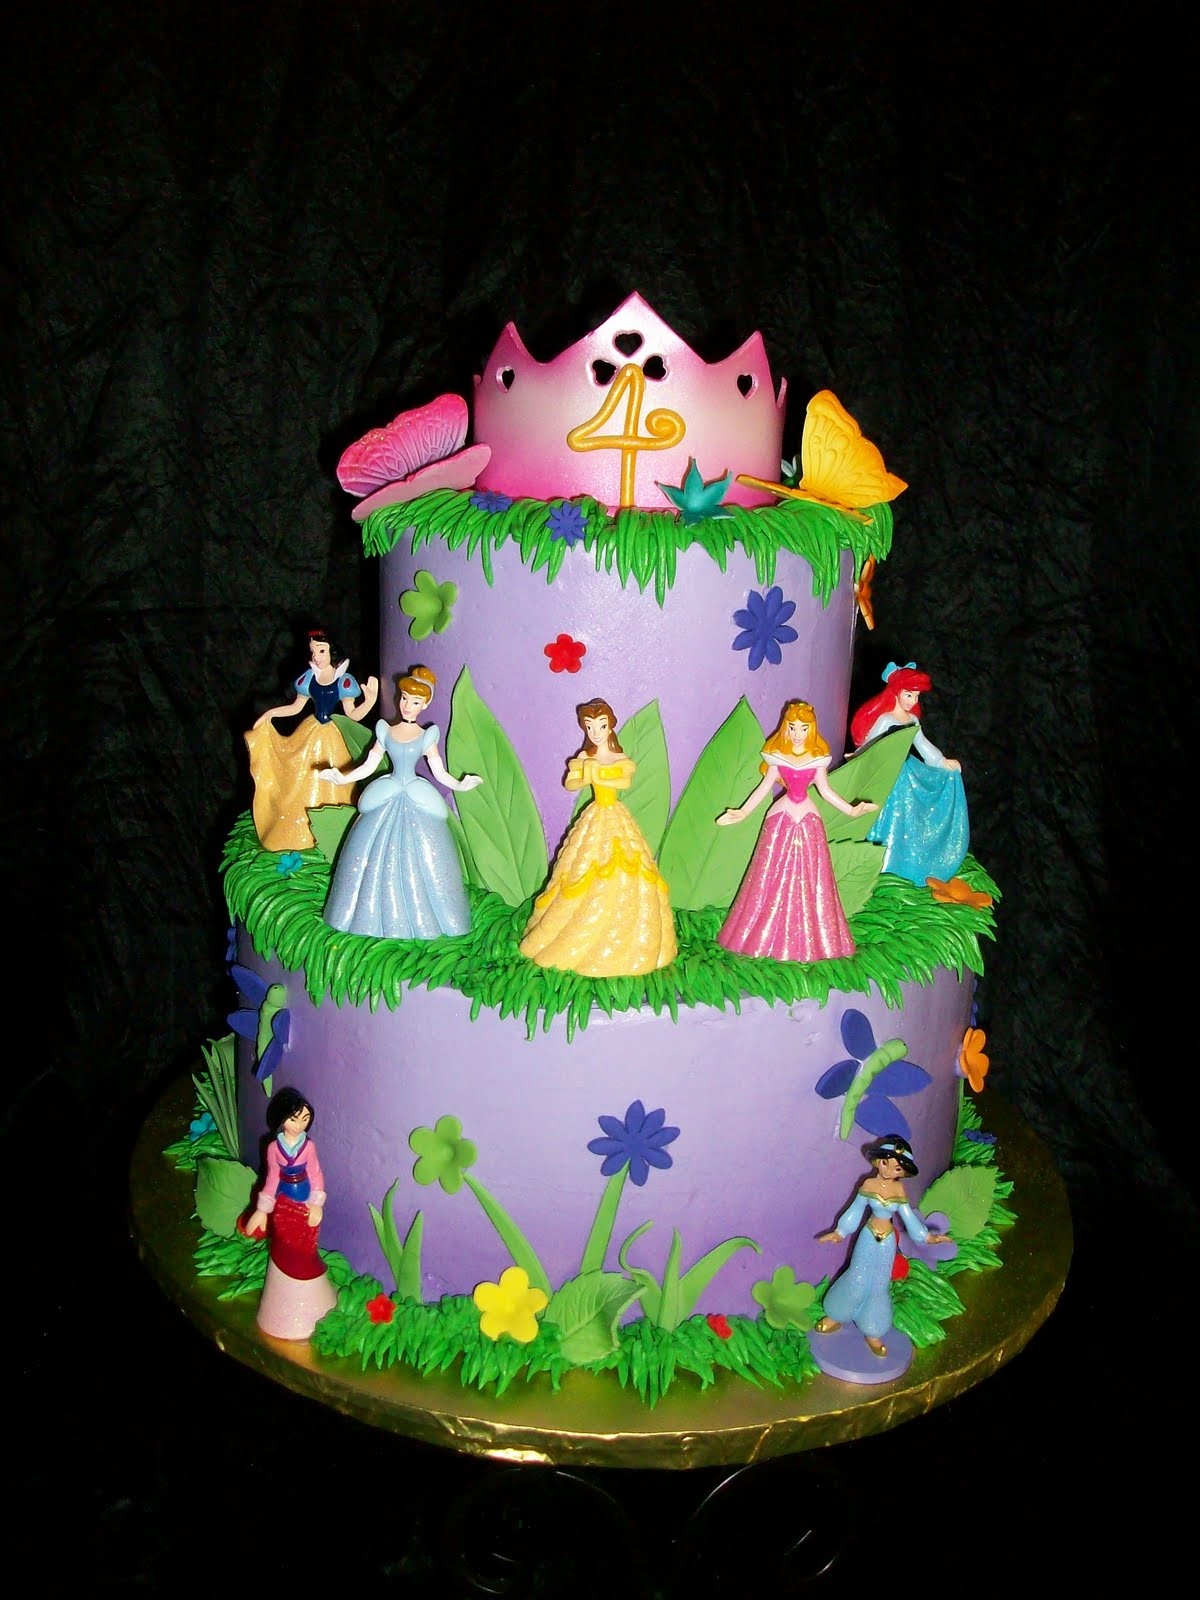 Pleasant Princess Birthday Cakes Photos Top Birthday Cake Pictures Funny Birthday Cards Online Inifofree Goldxyz